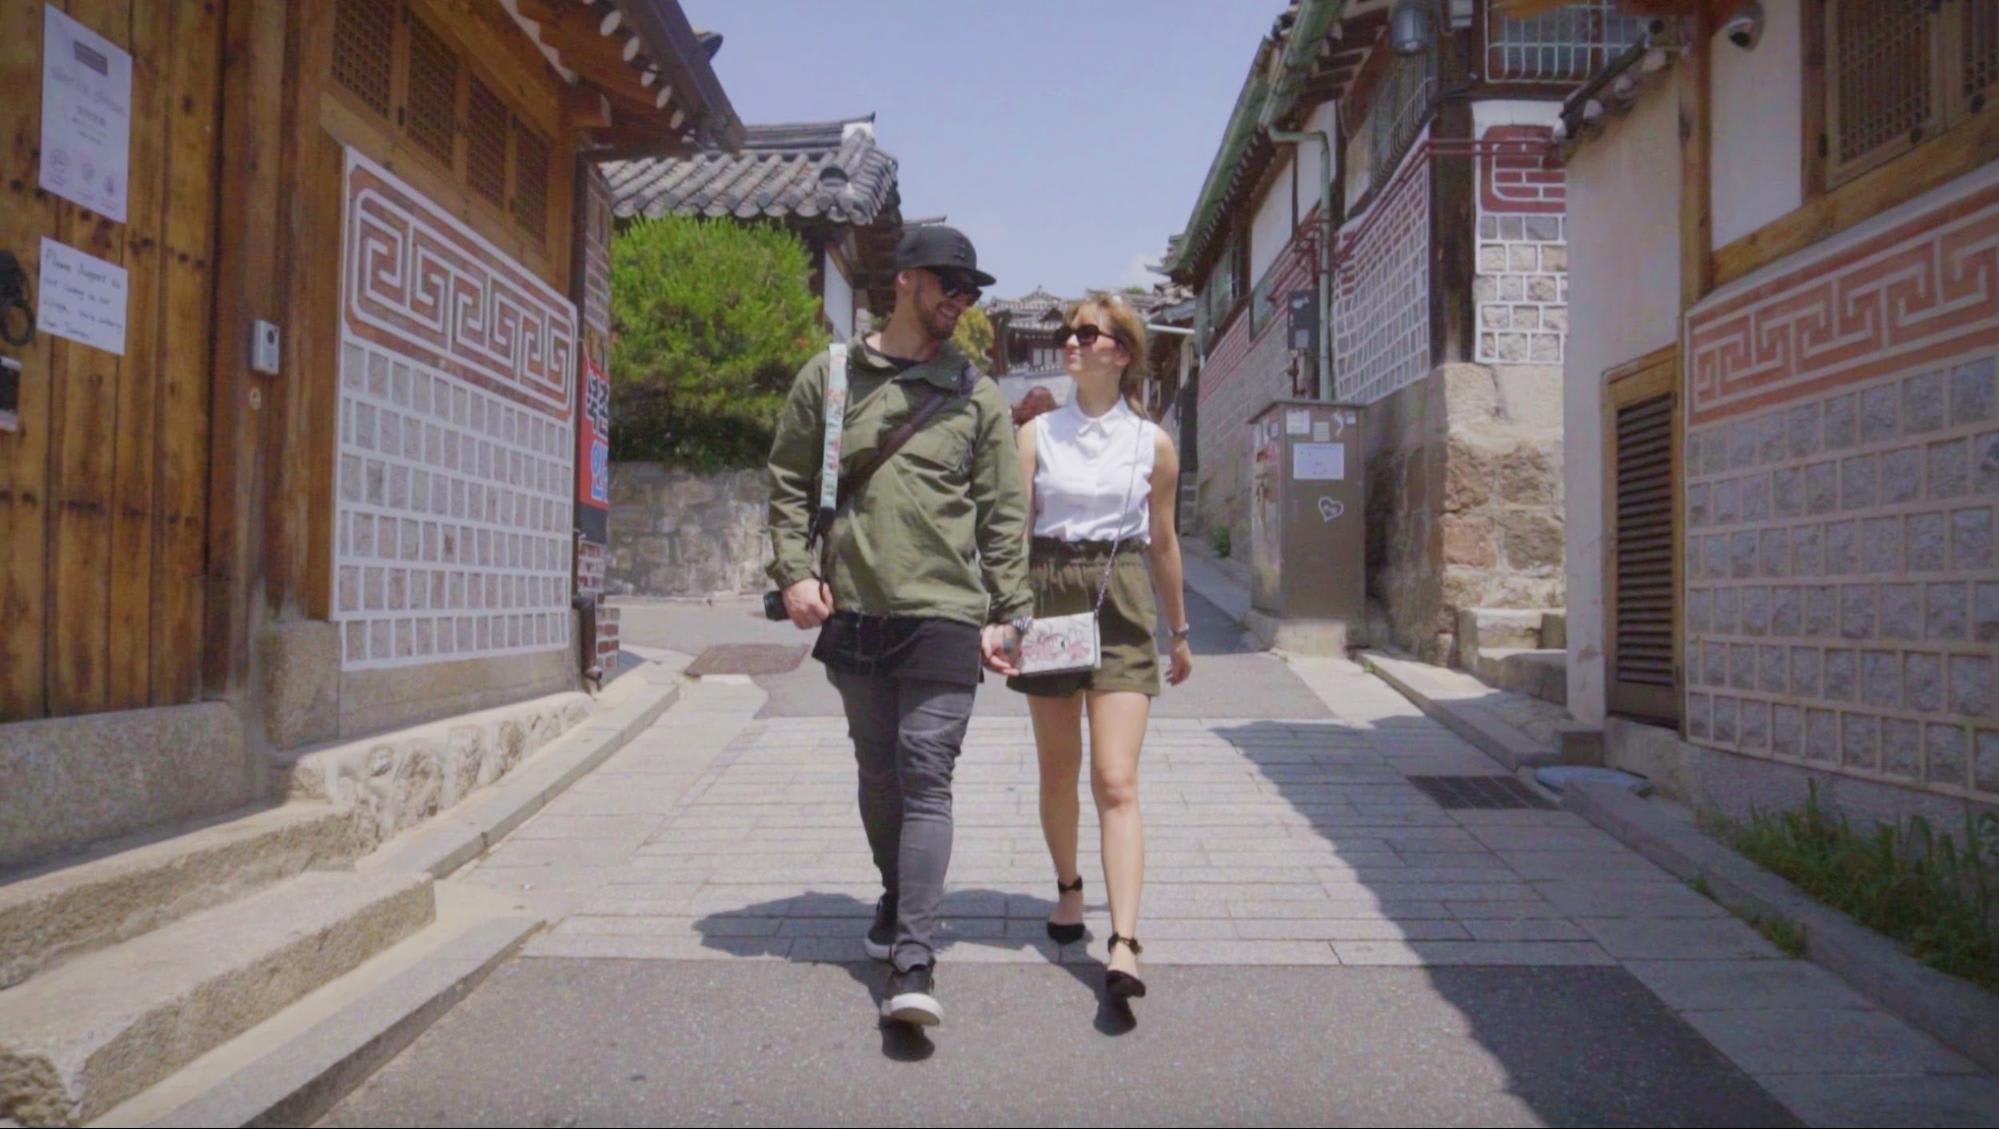 BILLY COLEEN SEOUL SOUTH KOREA bukchon hanok village